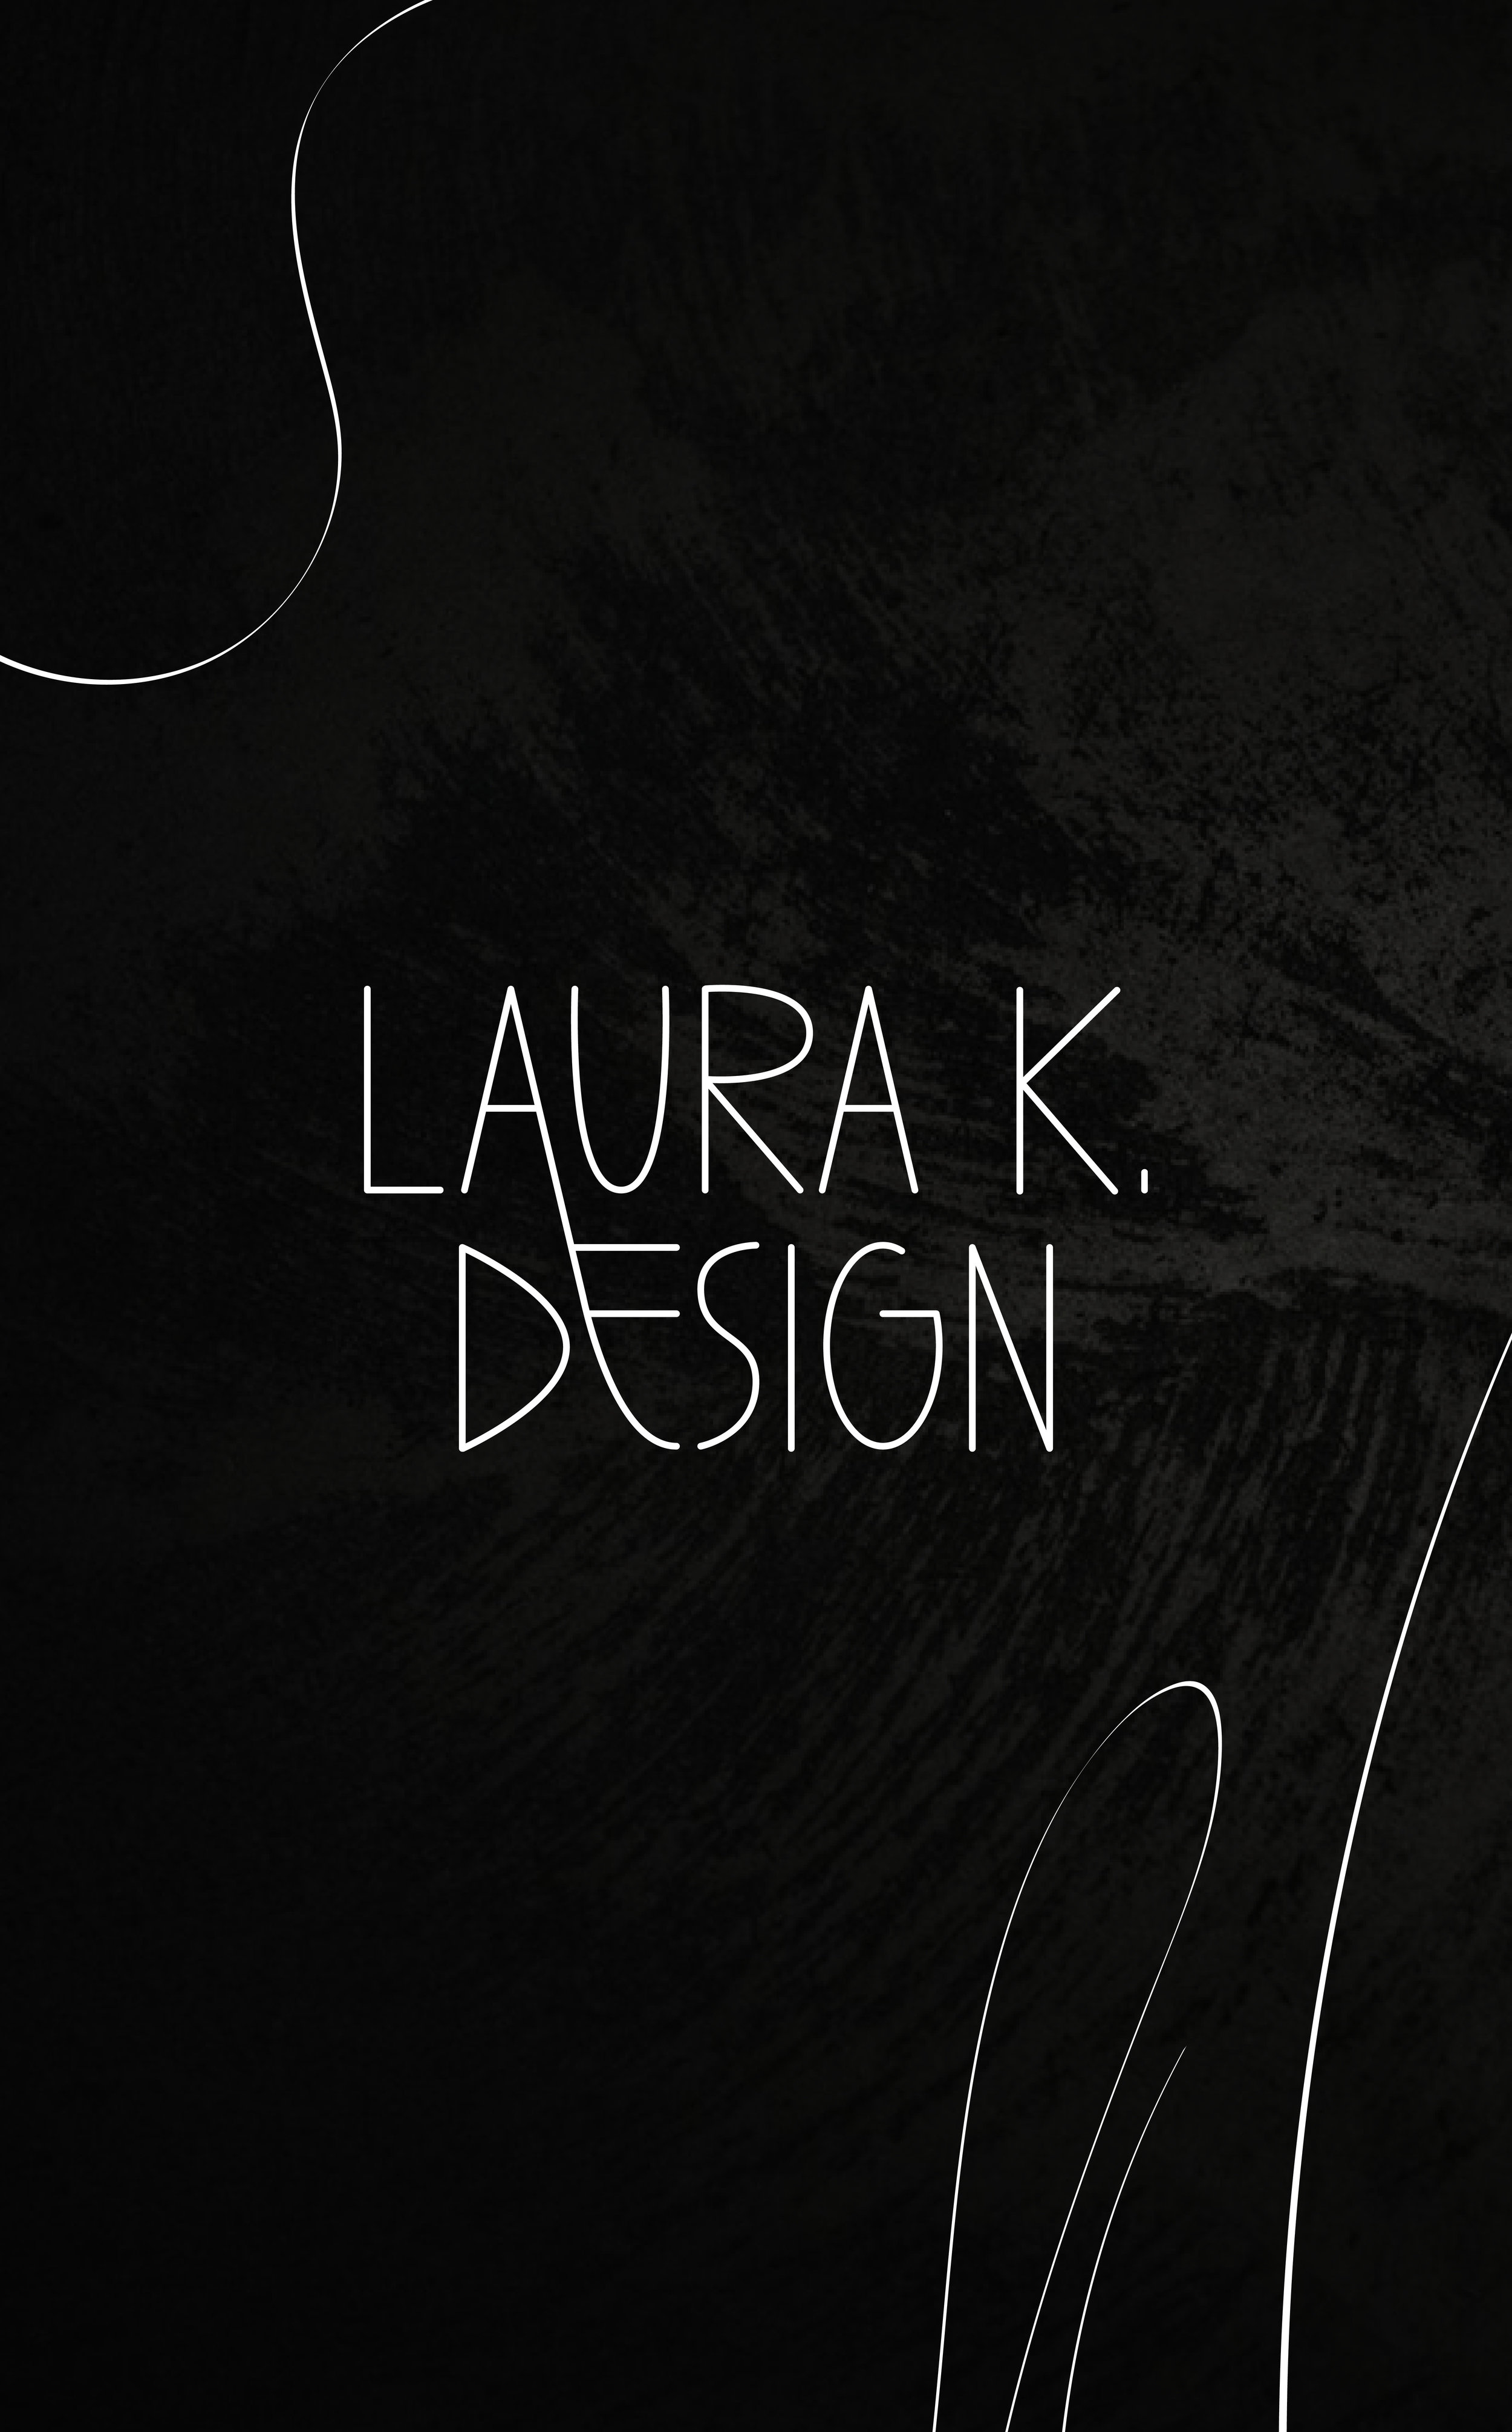 Laura K_logosuunnittelu_kansikuva.jpg